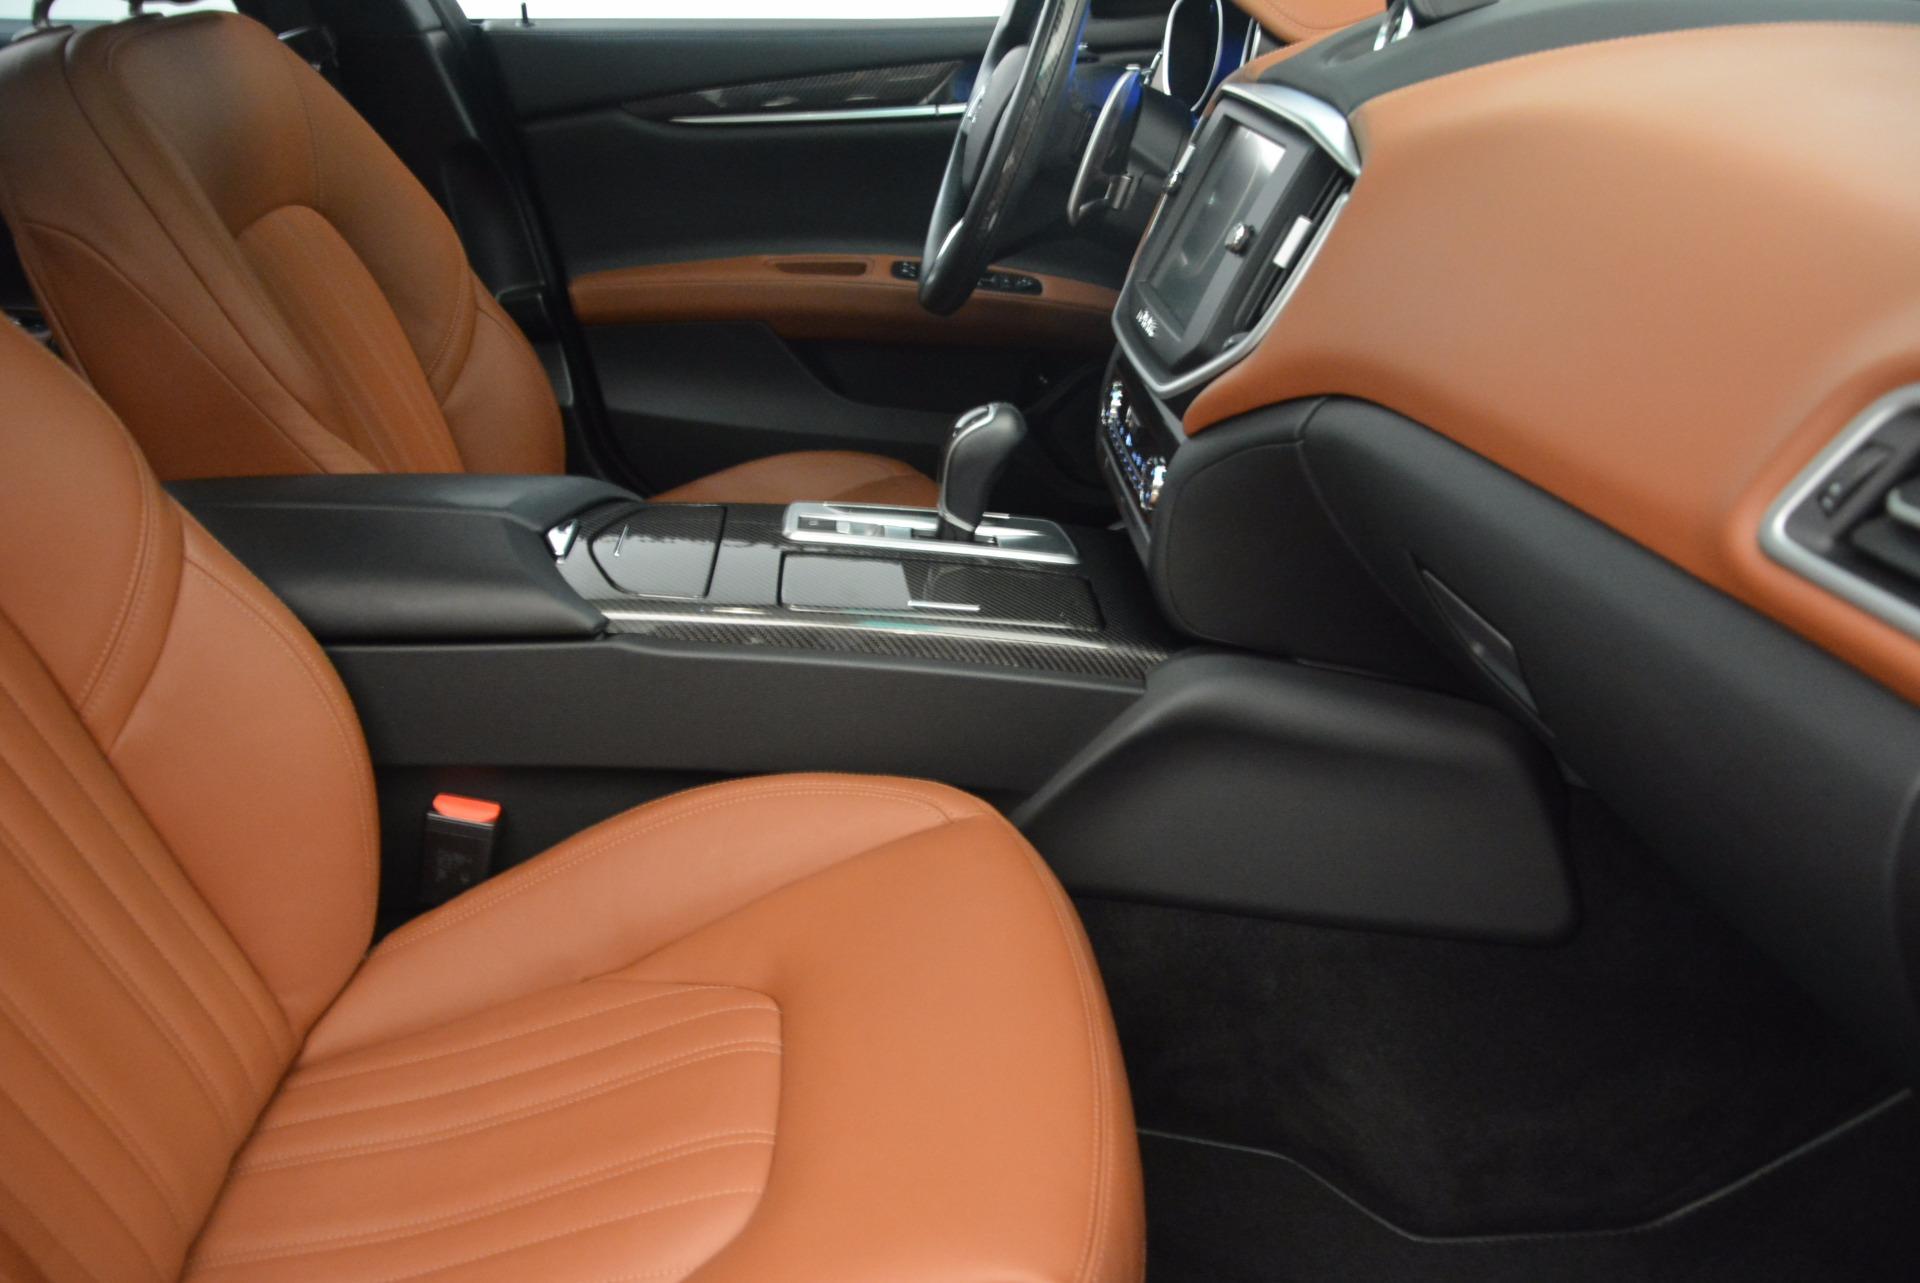 Used 2014 Maserati Ghibli S Q4 For Sale In Greenwich, CT 1587_p24